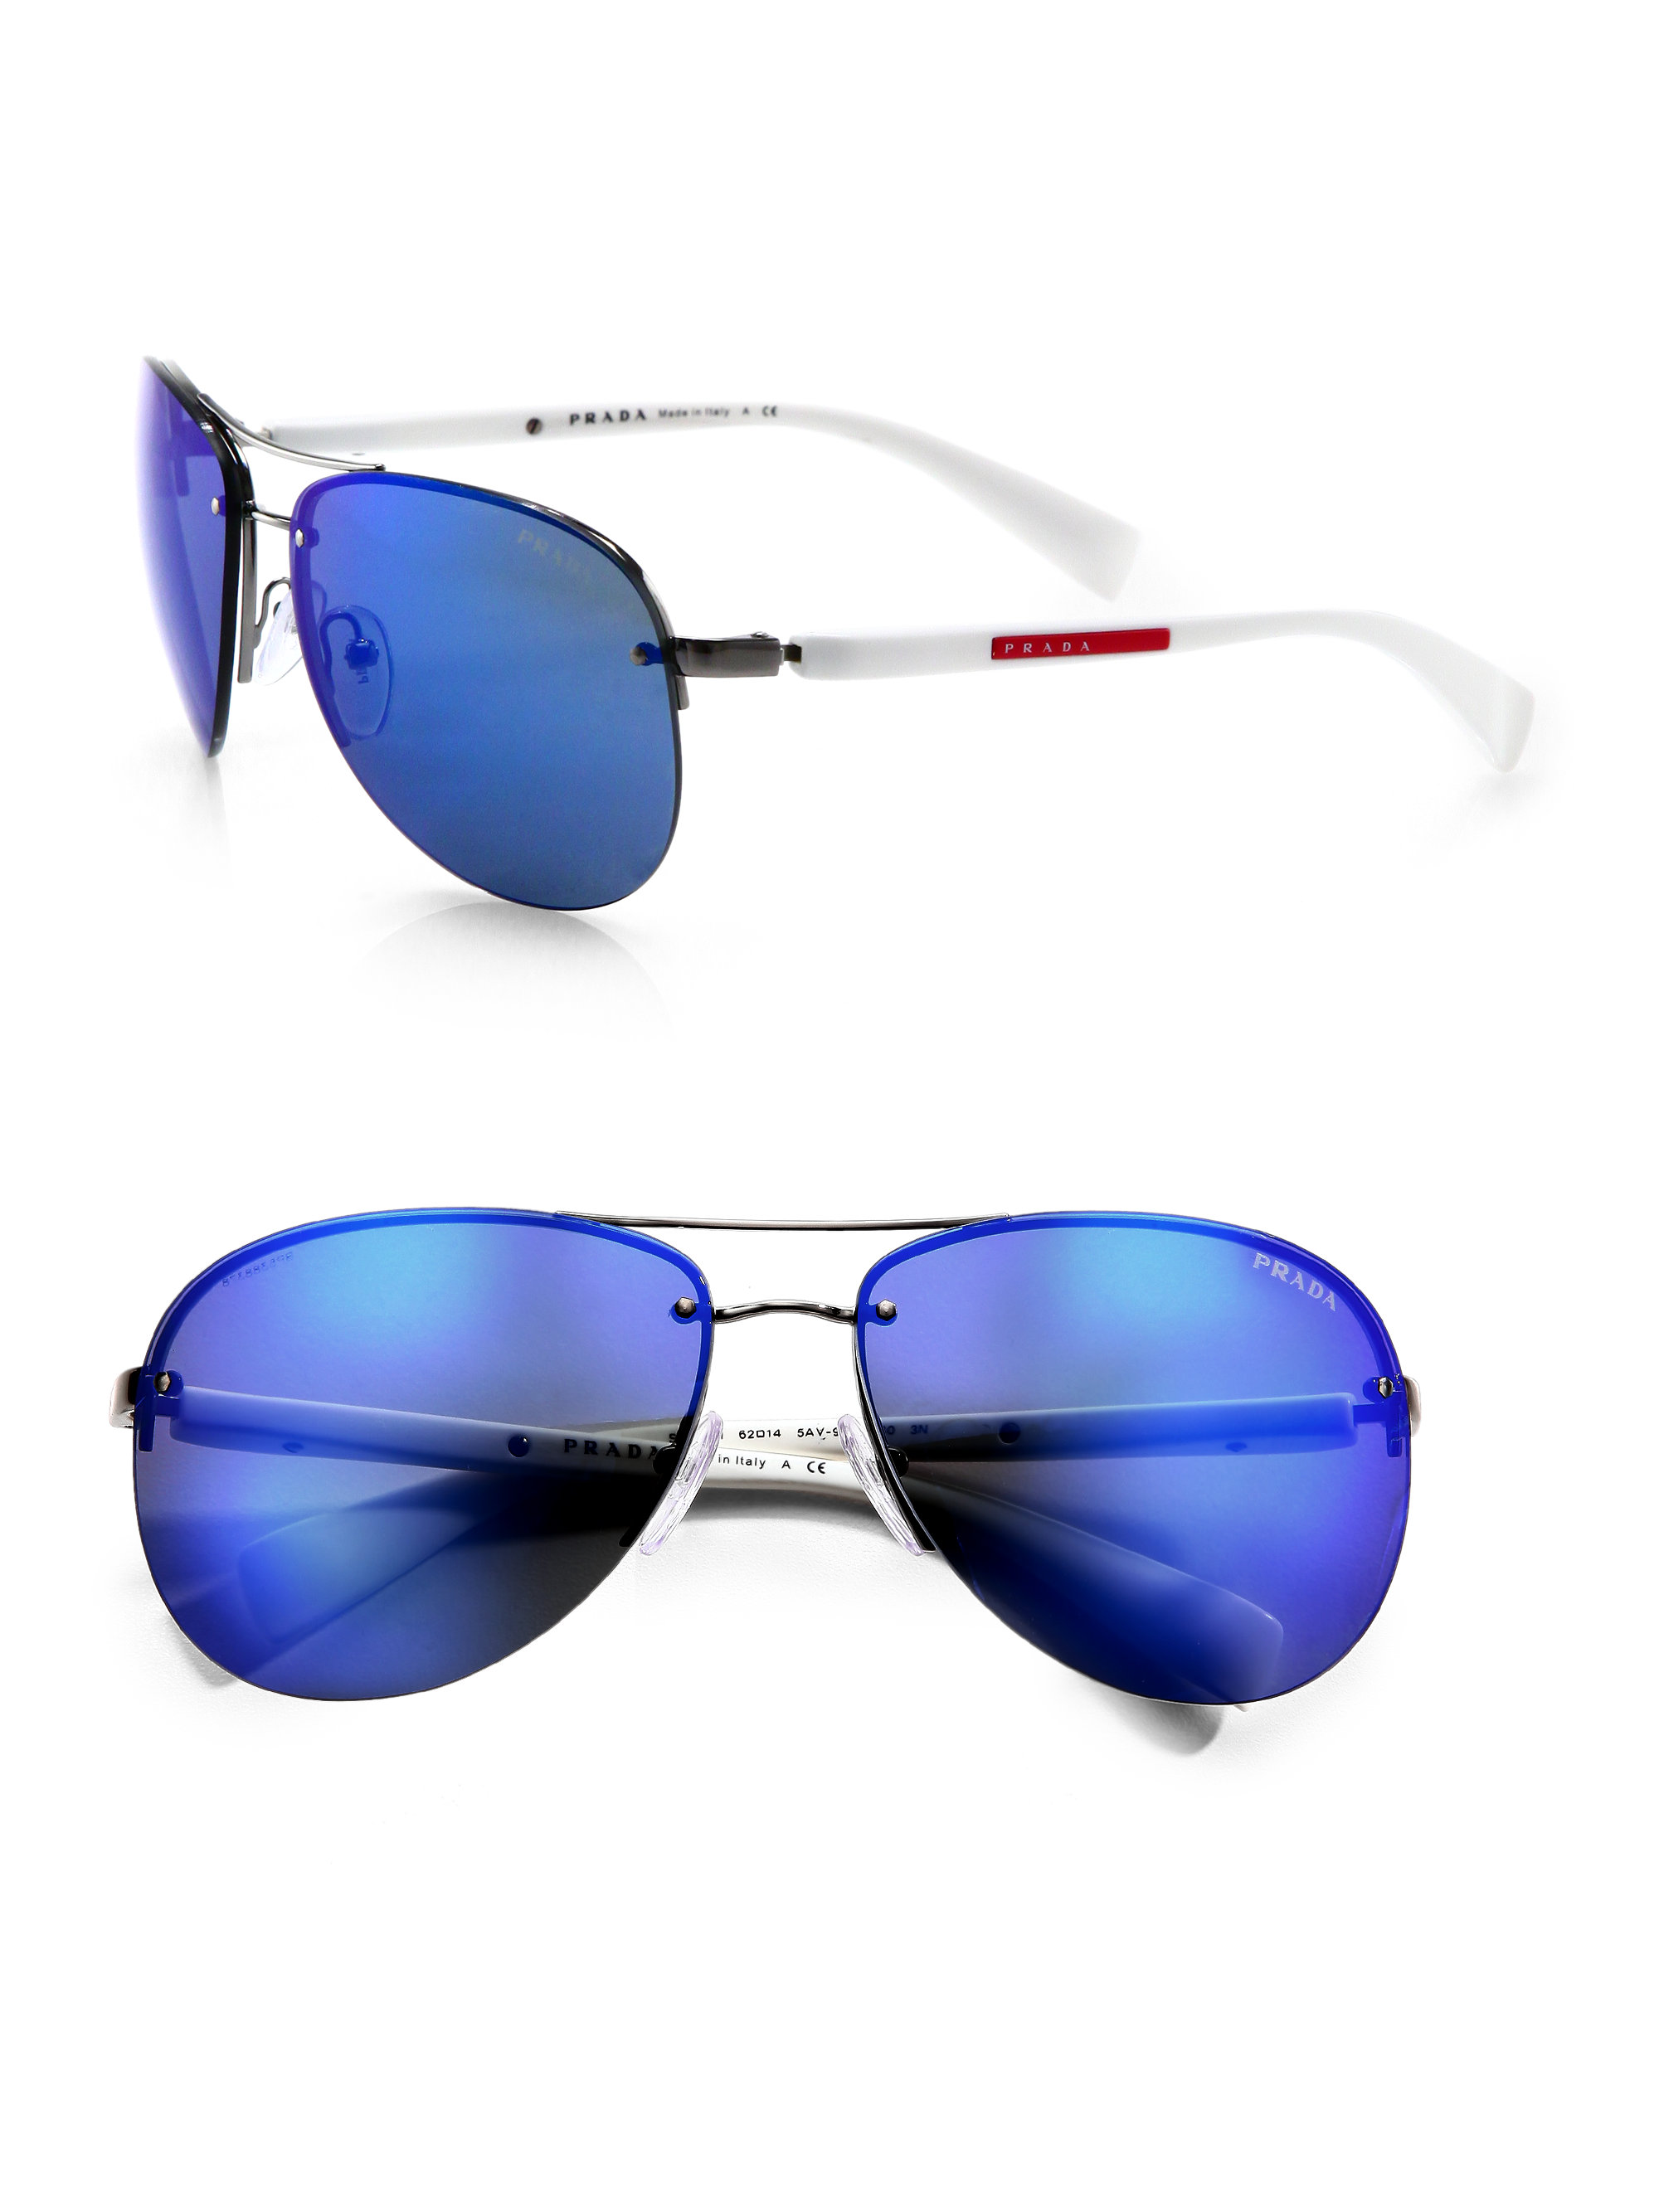 e24a1ba2f7d ... spain lyst prada metal aviator sunglasses in blue for men d1fac 63155